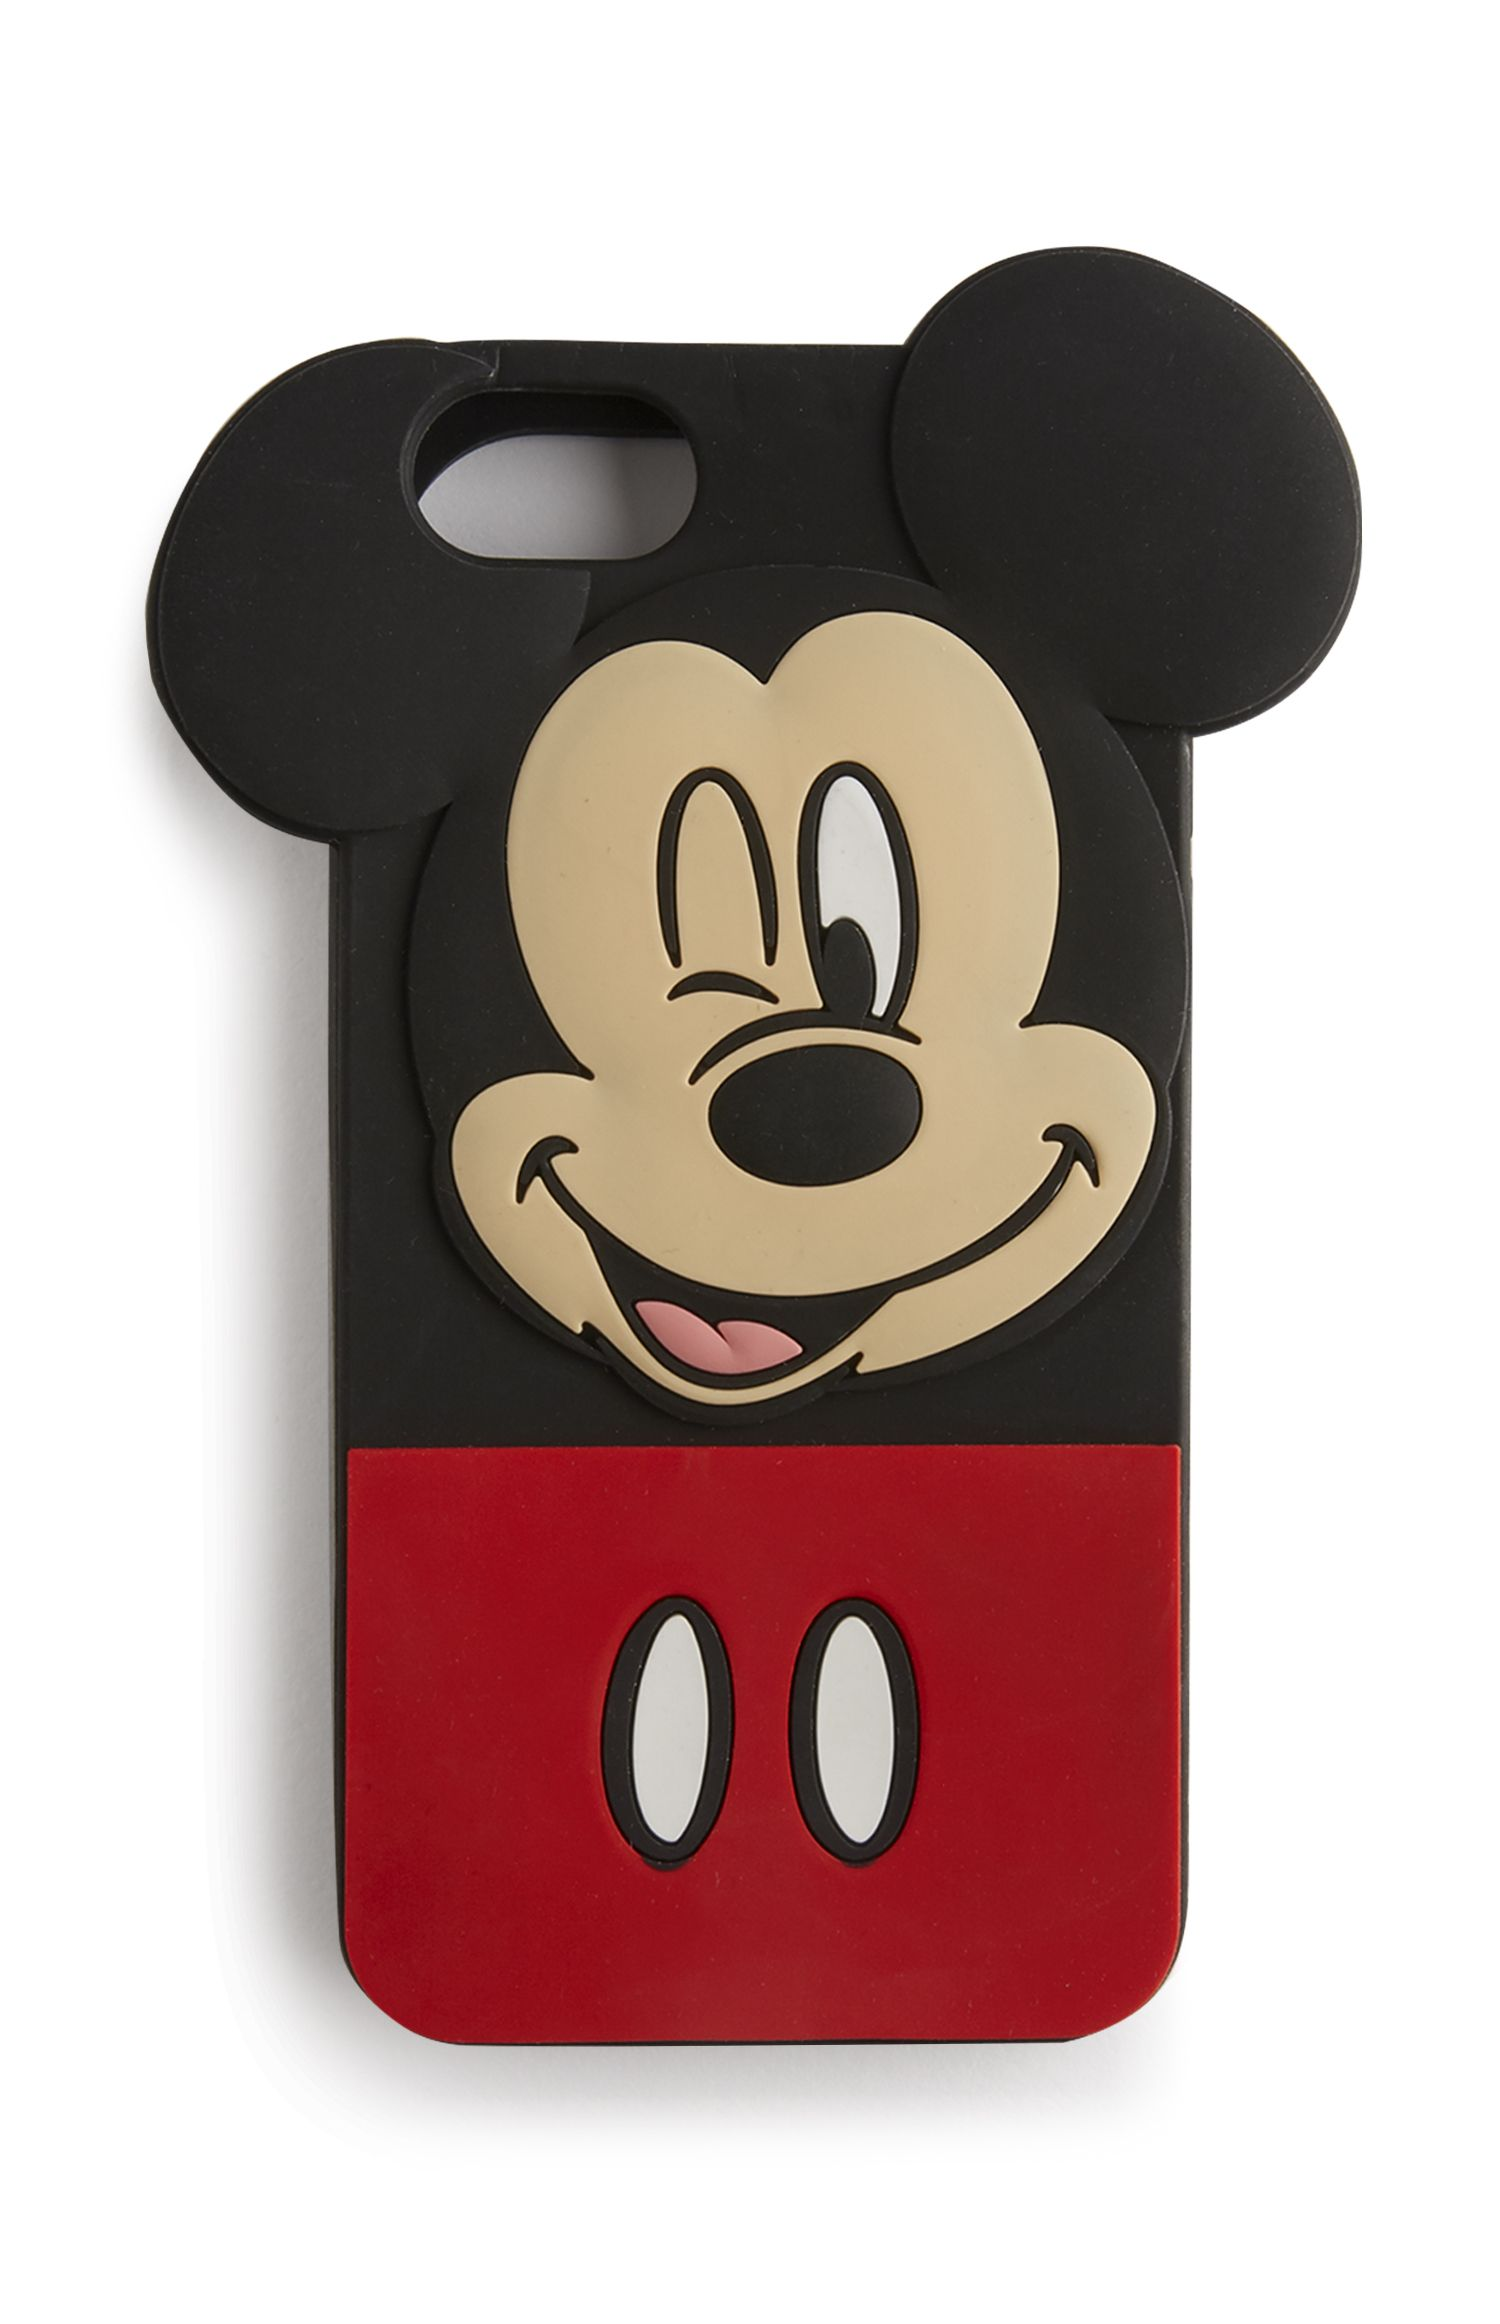 Fundas Disney Mickey Minnie Donald Stitch en Chandal.PARA TODOS